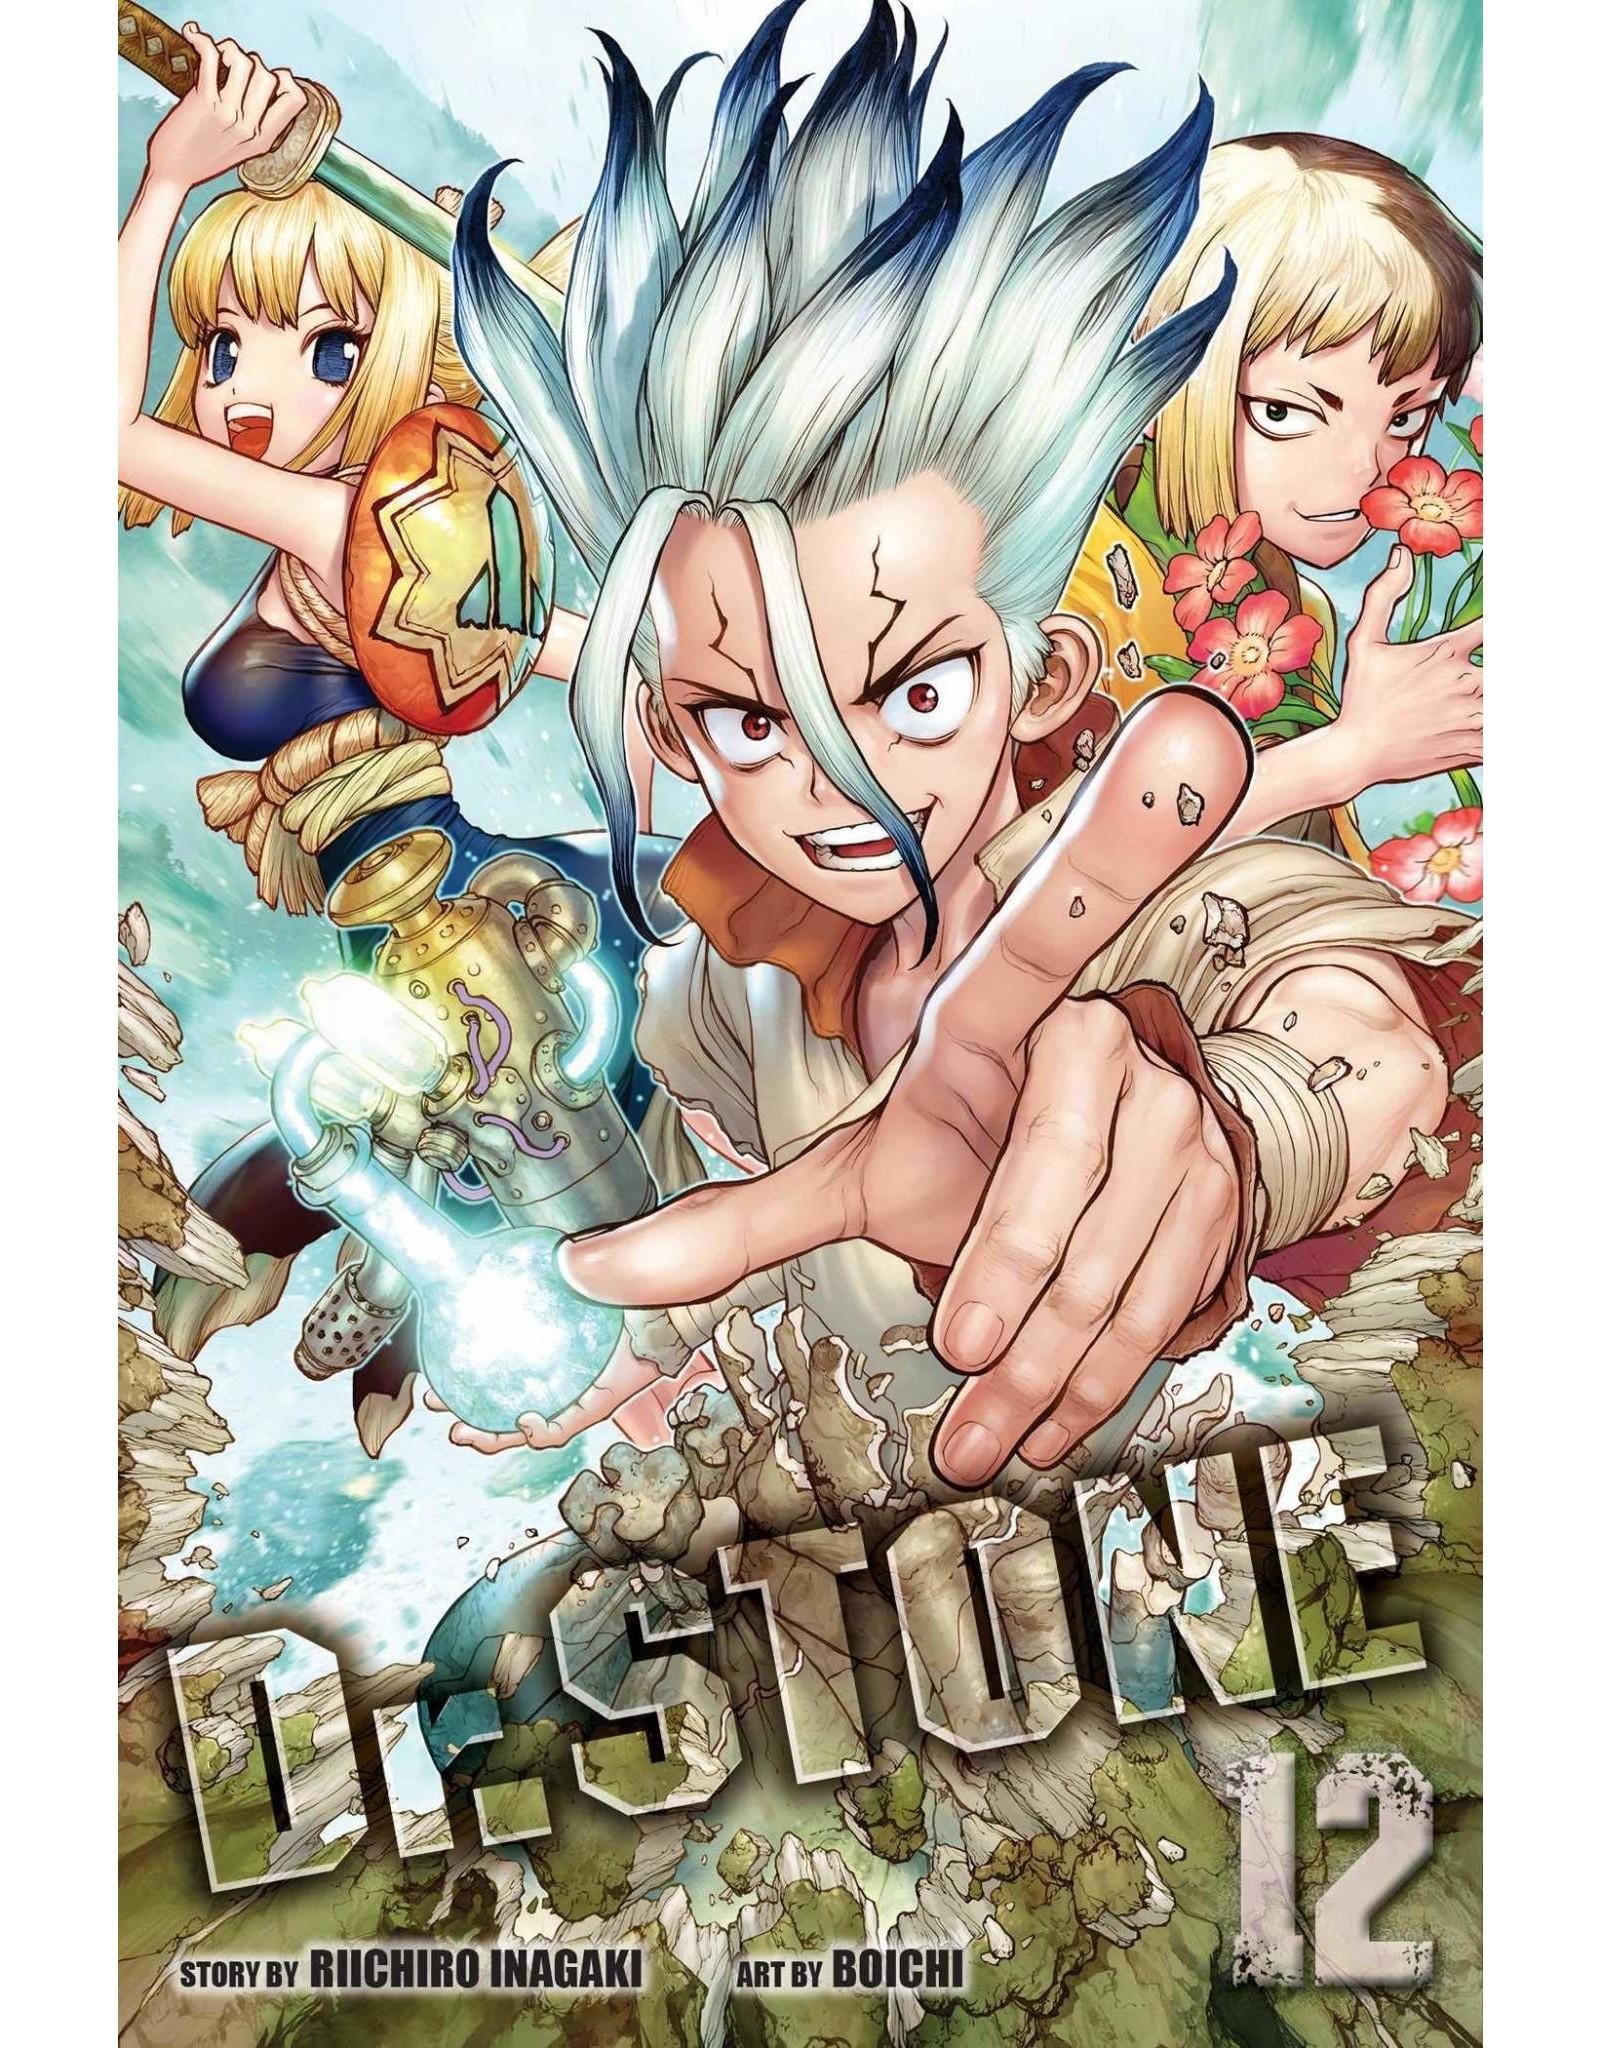 Dr. Stone 12 (English version)